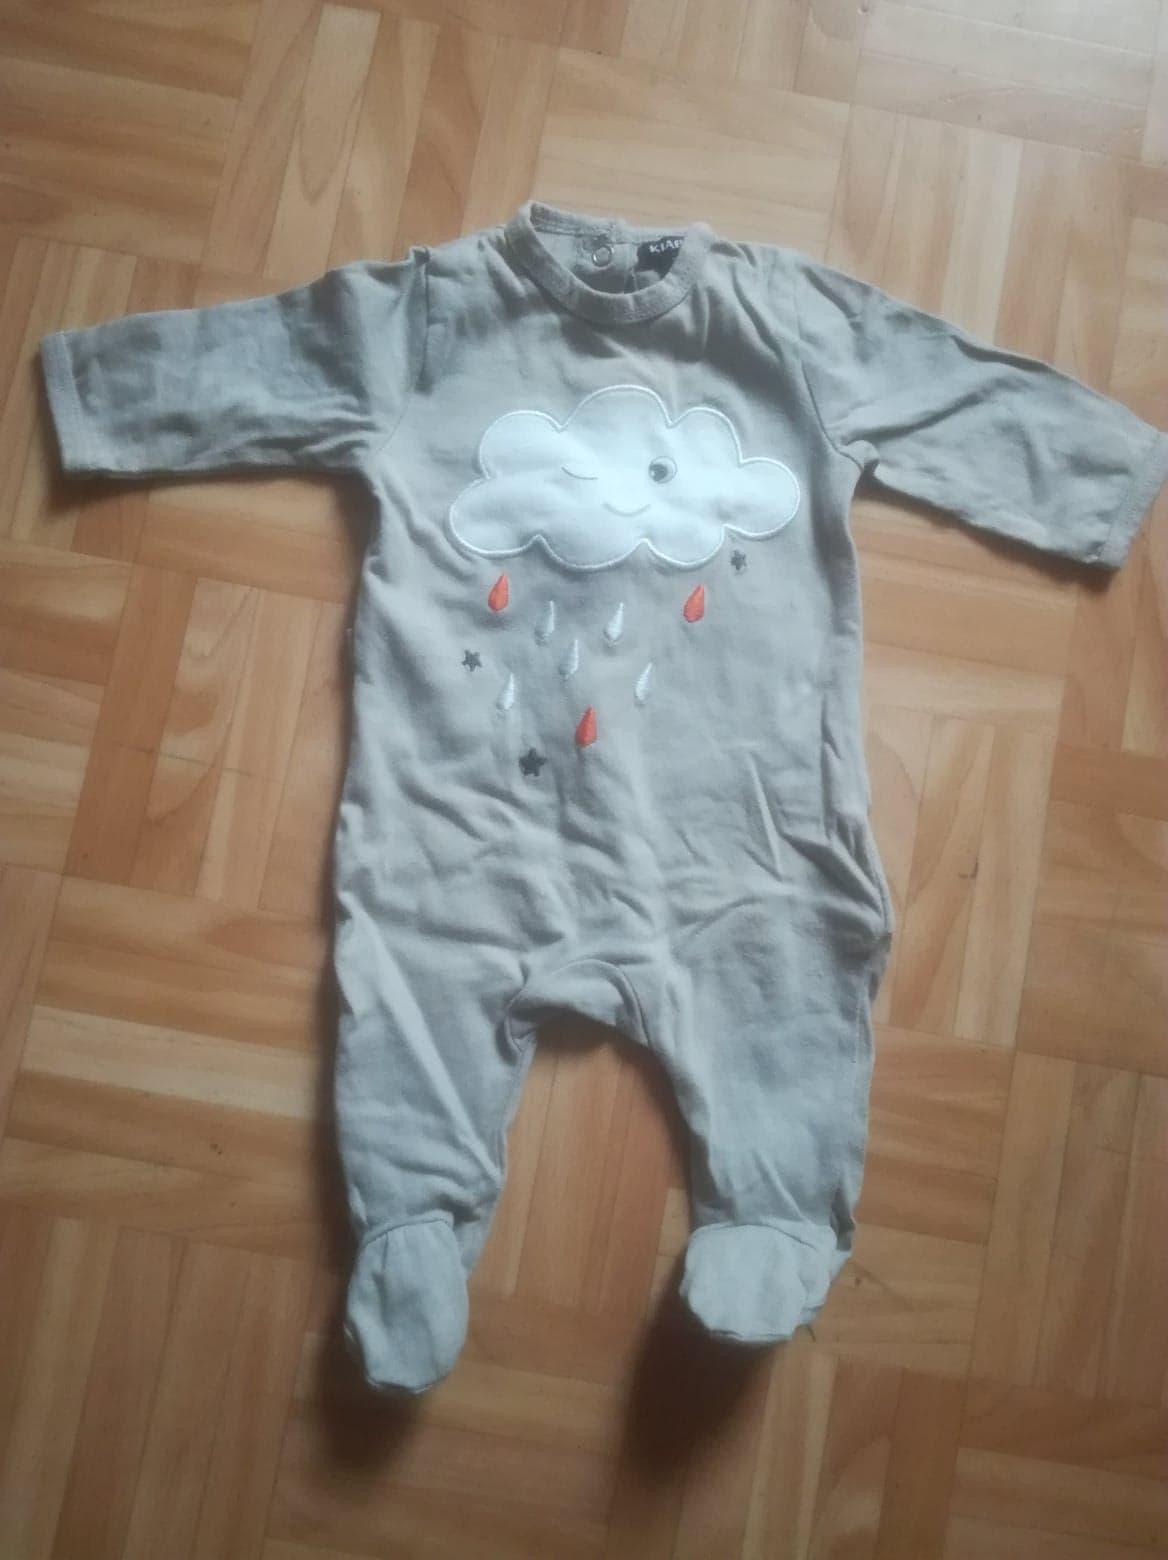 troc de troc lot 3 pyjama 1 mois image 1